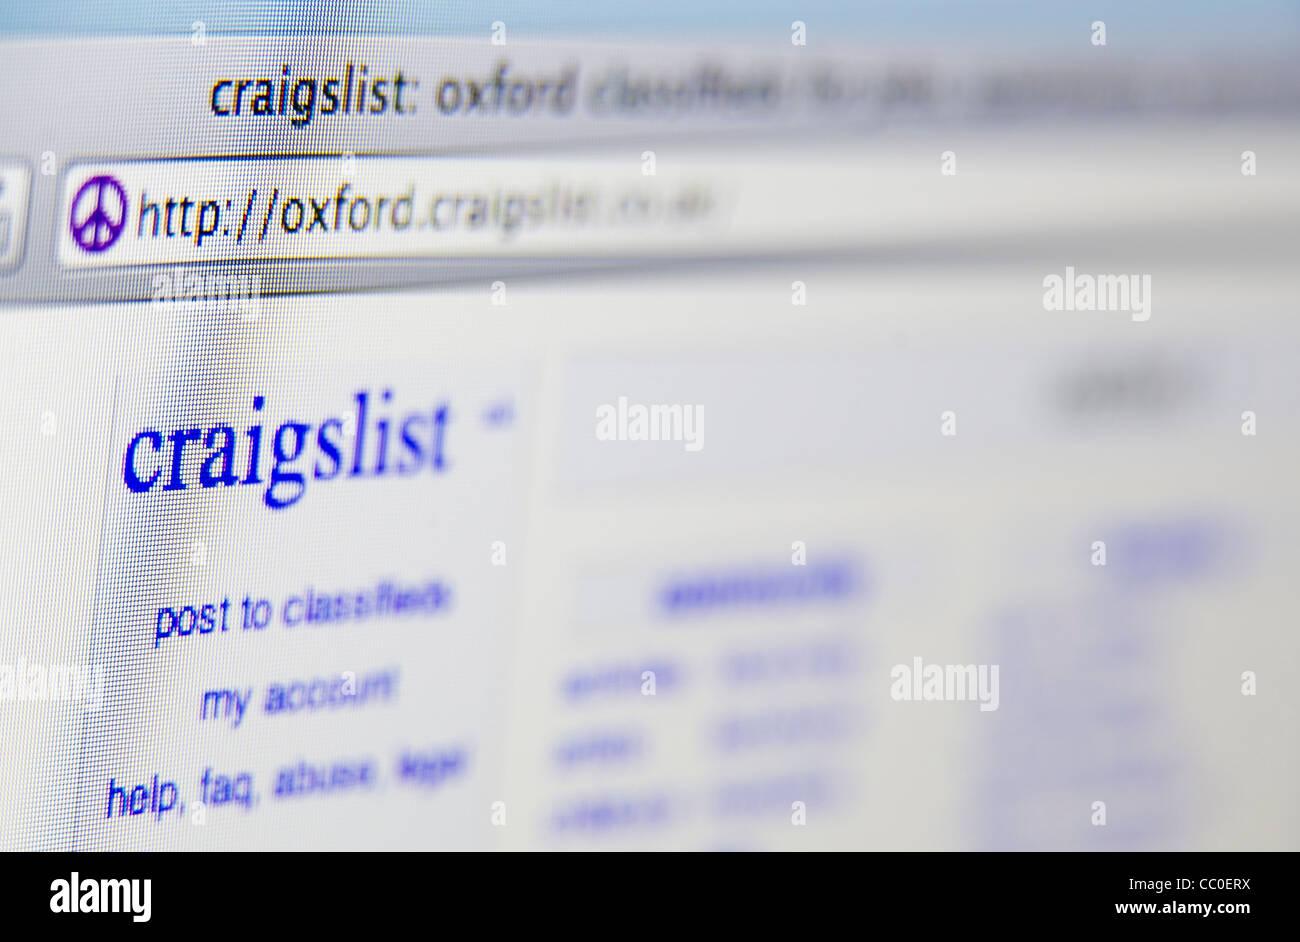 craigslist craigs list website screen stock photo 41808254 alamy